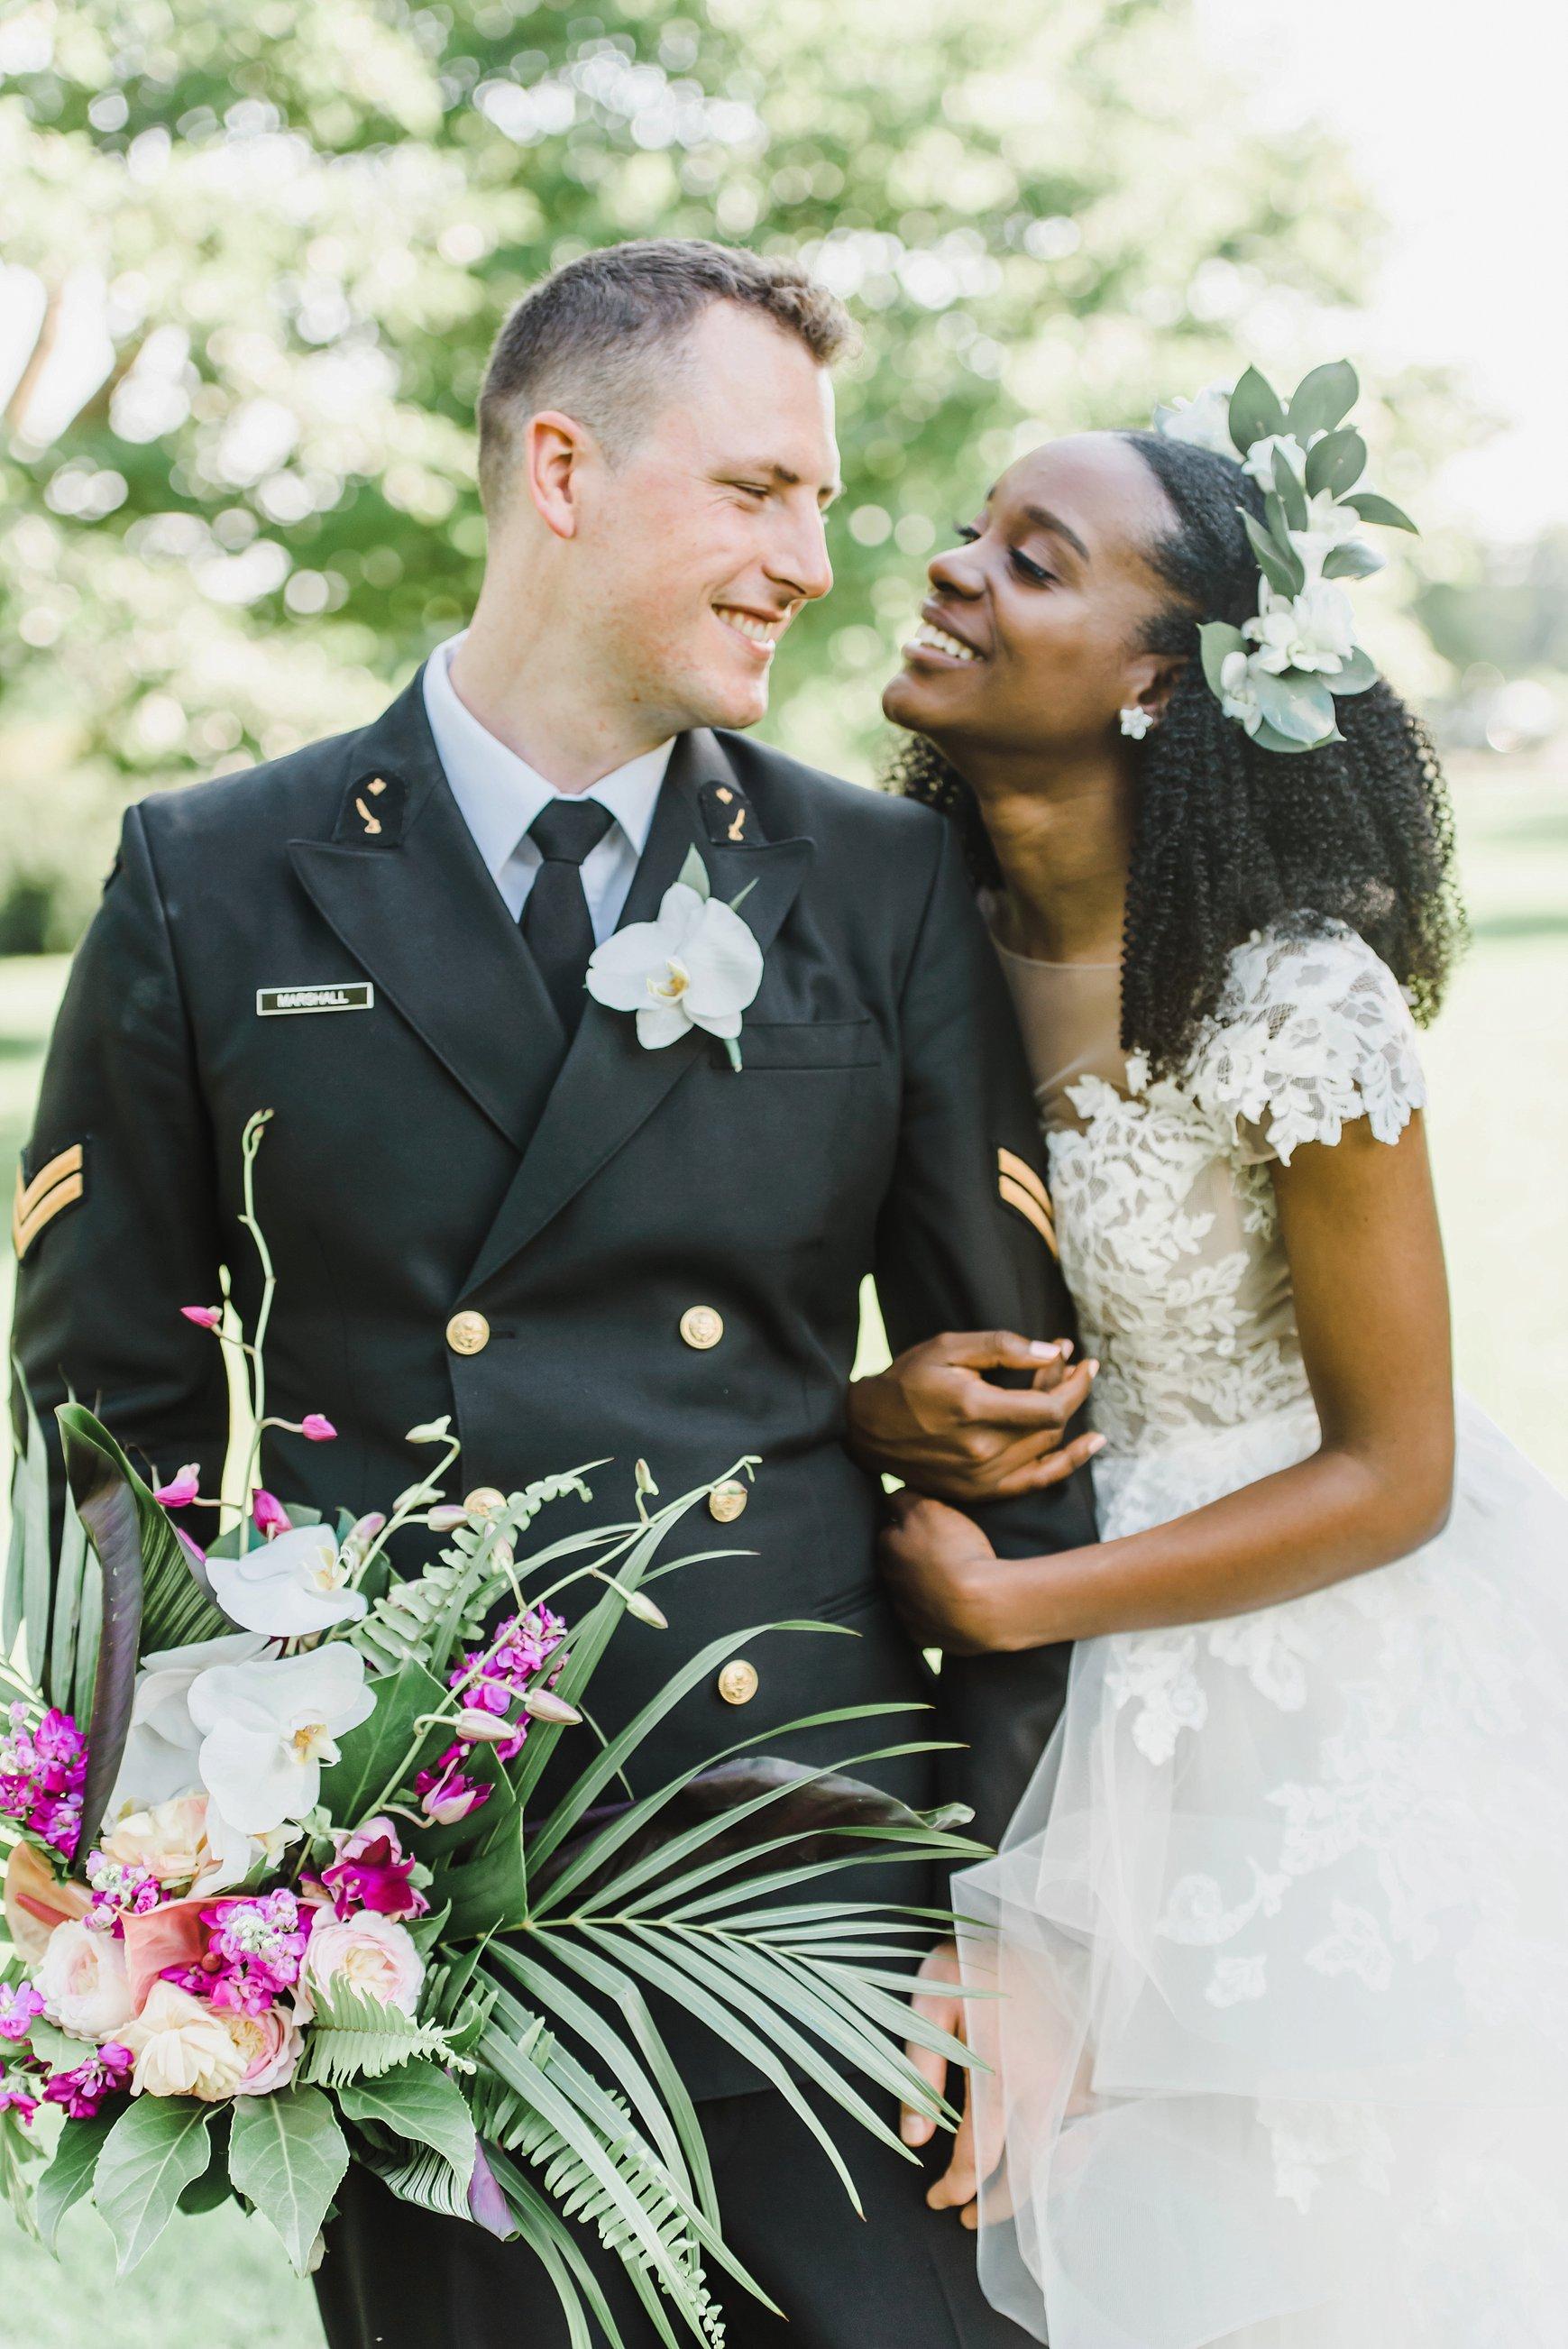 light airy indie fine art ottawa wedding photographer | Ali and Batoul Photography_1005.jpg